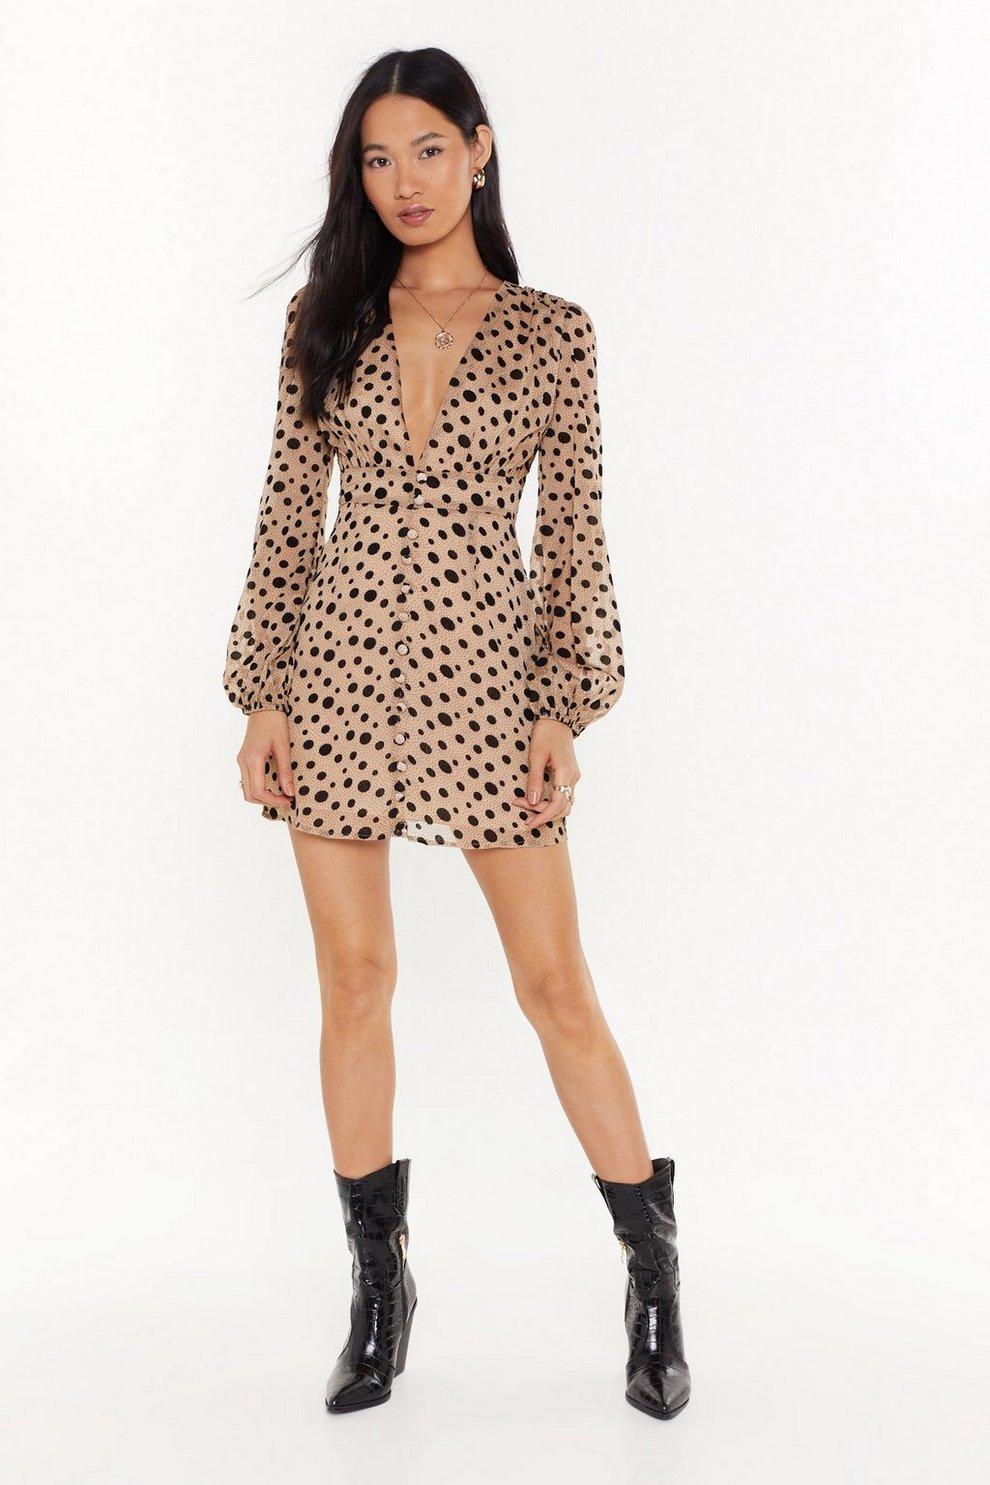 ee84ac69cacae Dot Summer Nights Polka Dot Mini Dress | Shop Clothes at Nasty Gal!